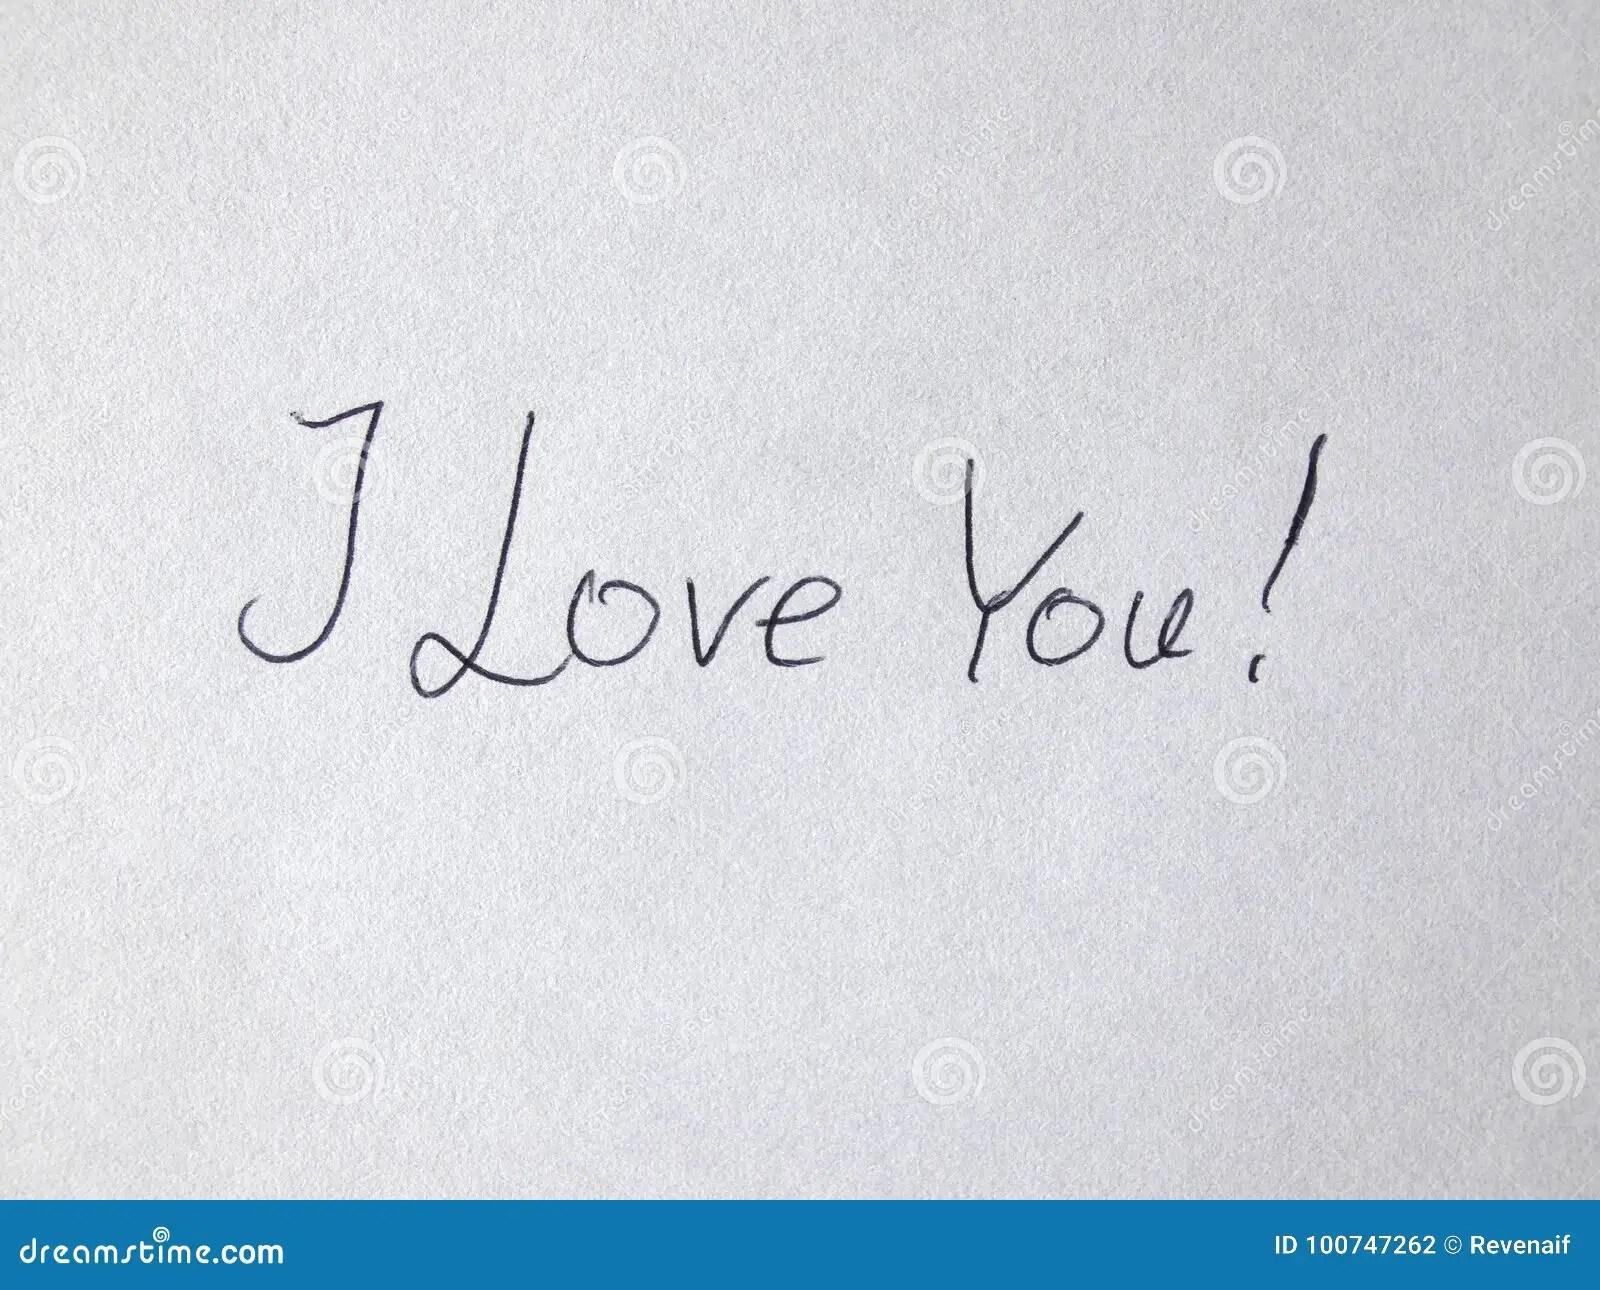 I Love You Handwritten On Paper Stock Photo